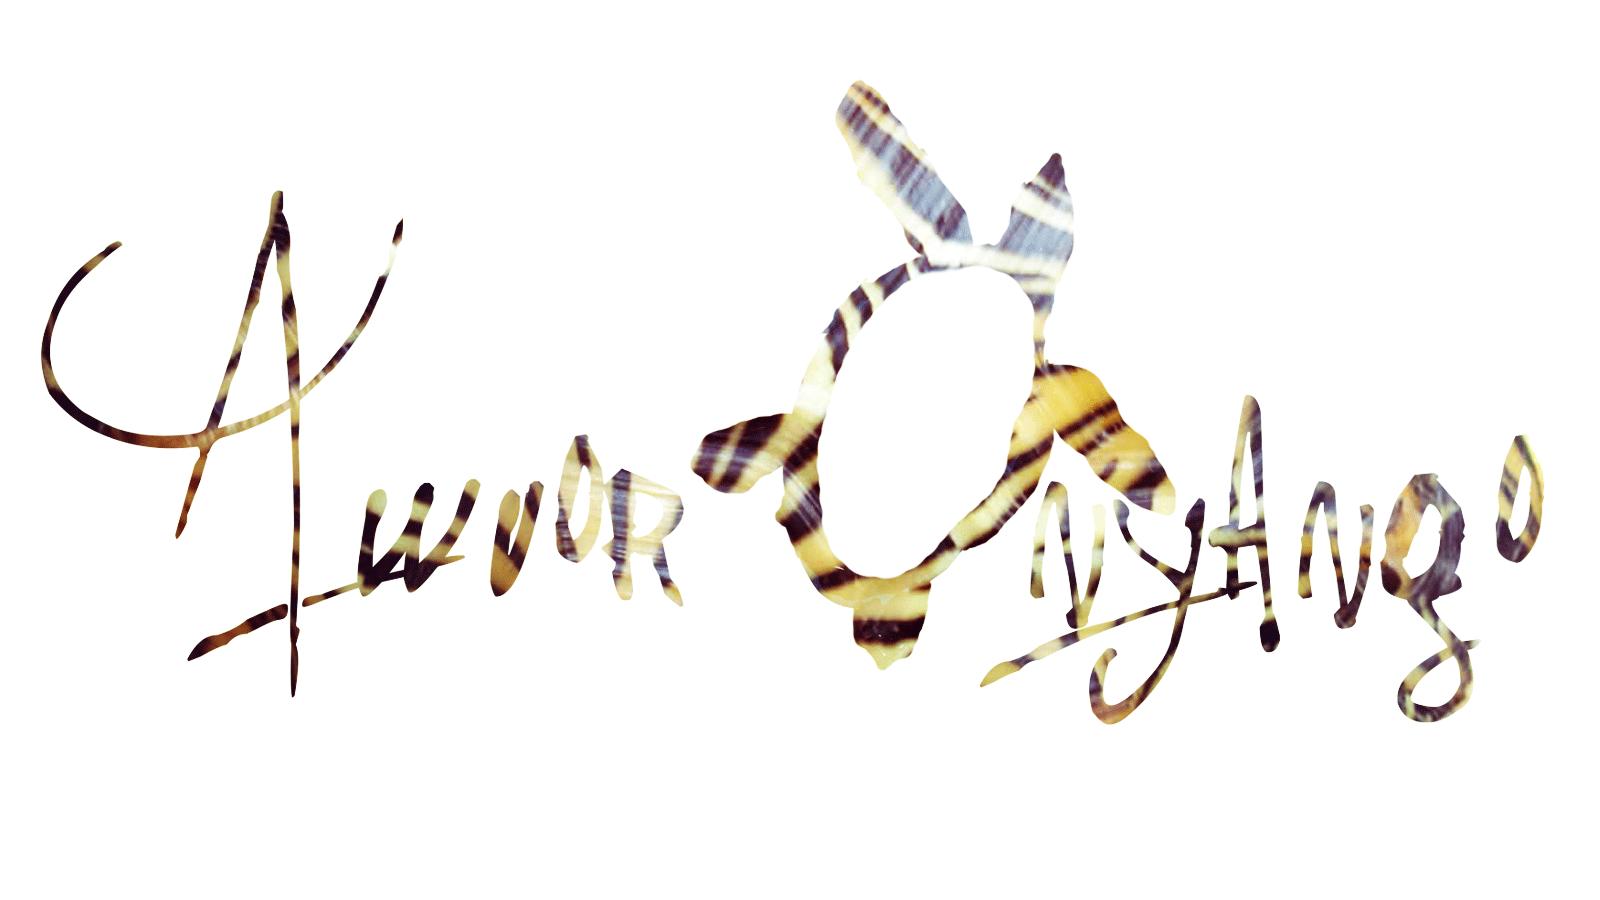 Awuor Onyango's Signature